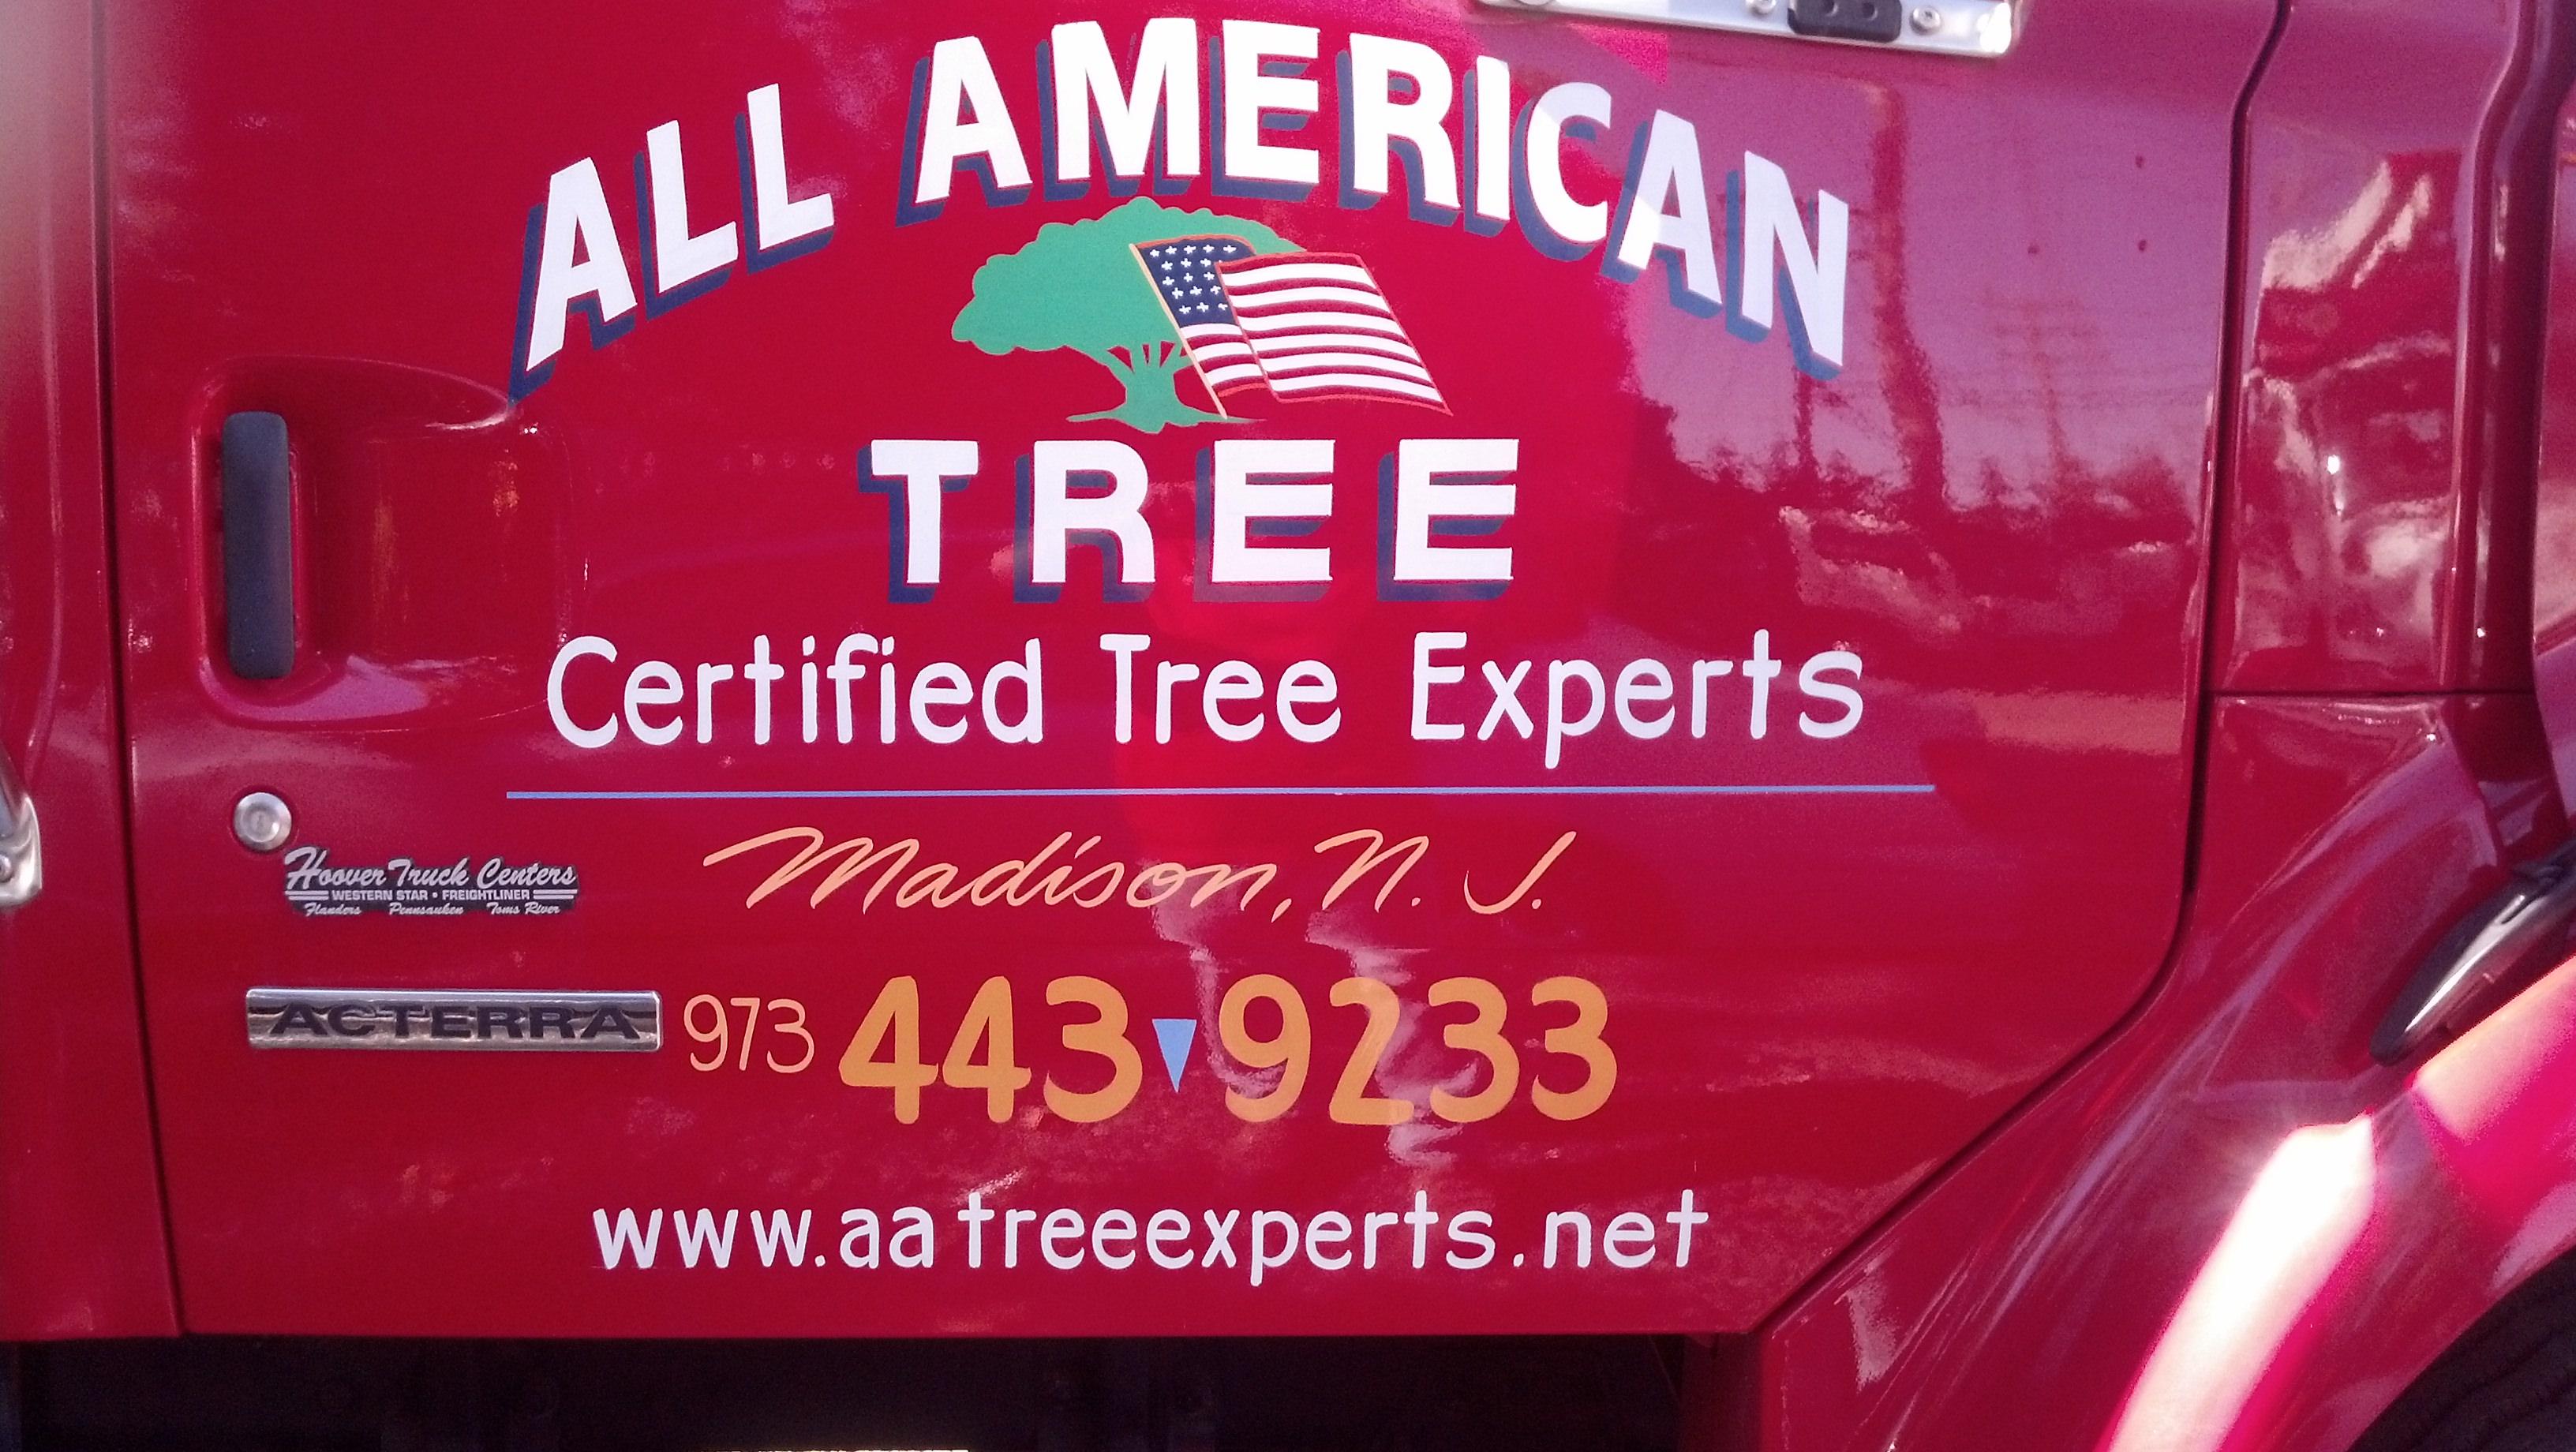 All American Tree Service